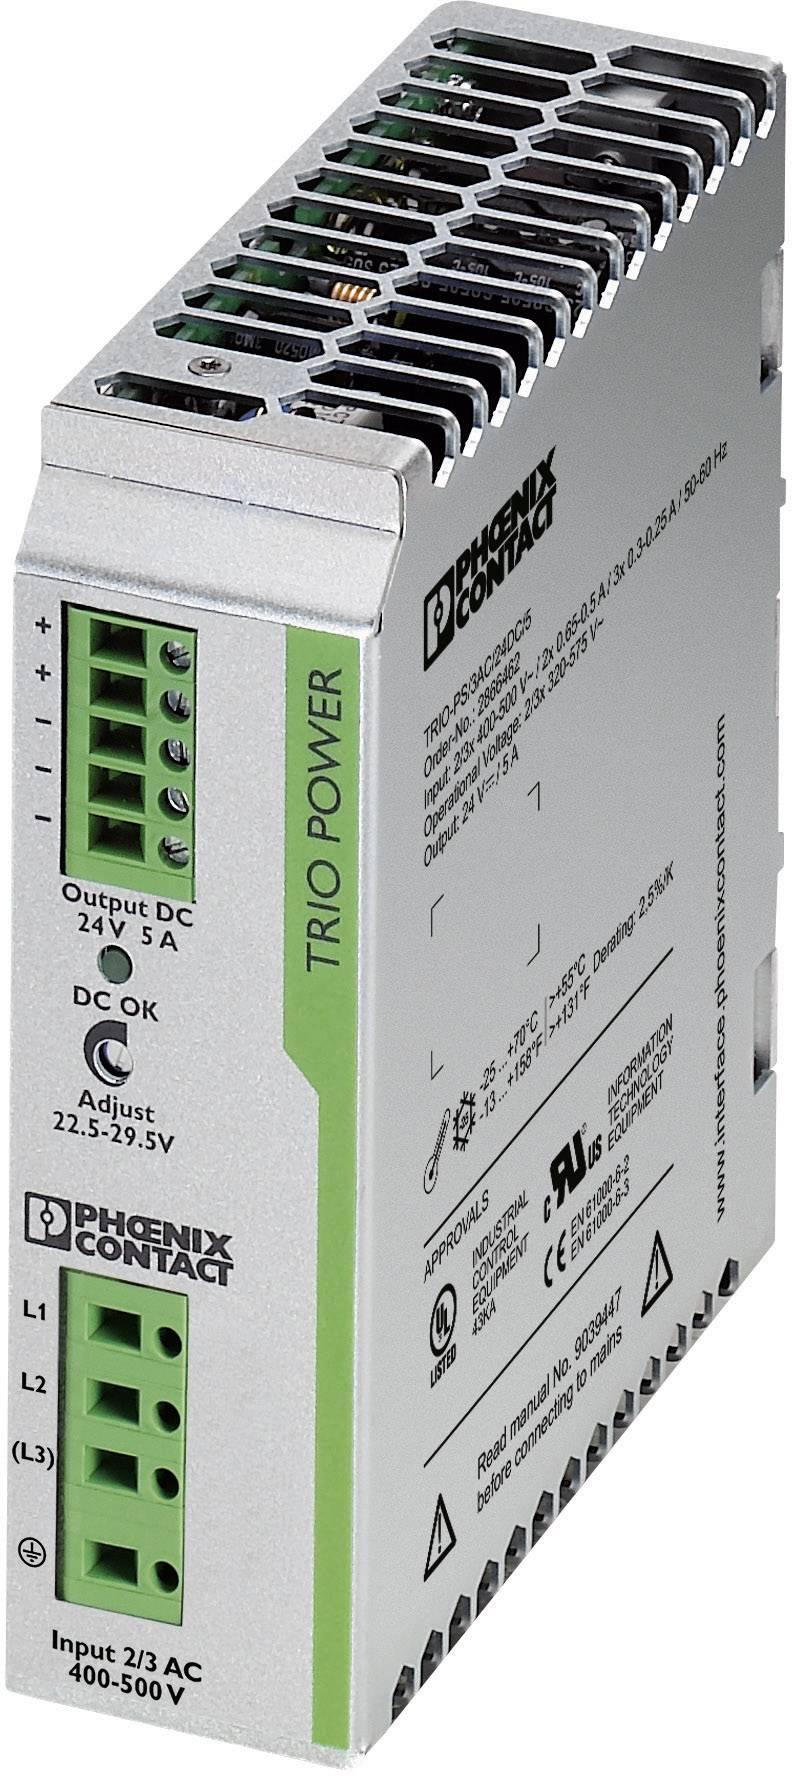 Sieťový zdroj na montážnu lištu (DIN lištu) Phoenix Contact TRIO-PS/3AC/24DC/5, 1 x, 24 V/DC, 5 A, 120 W